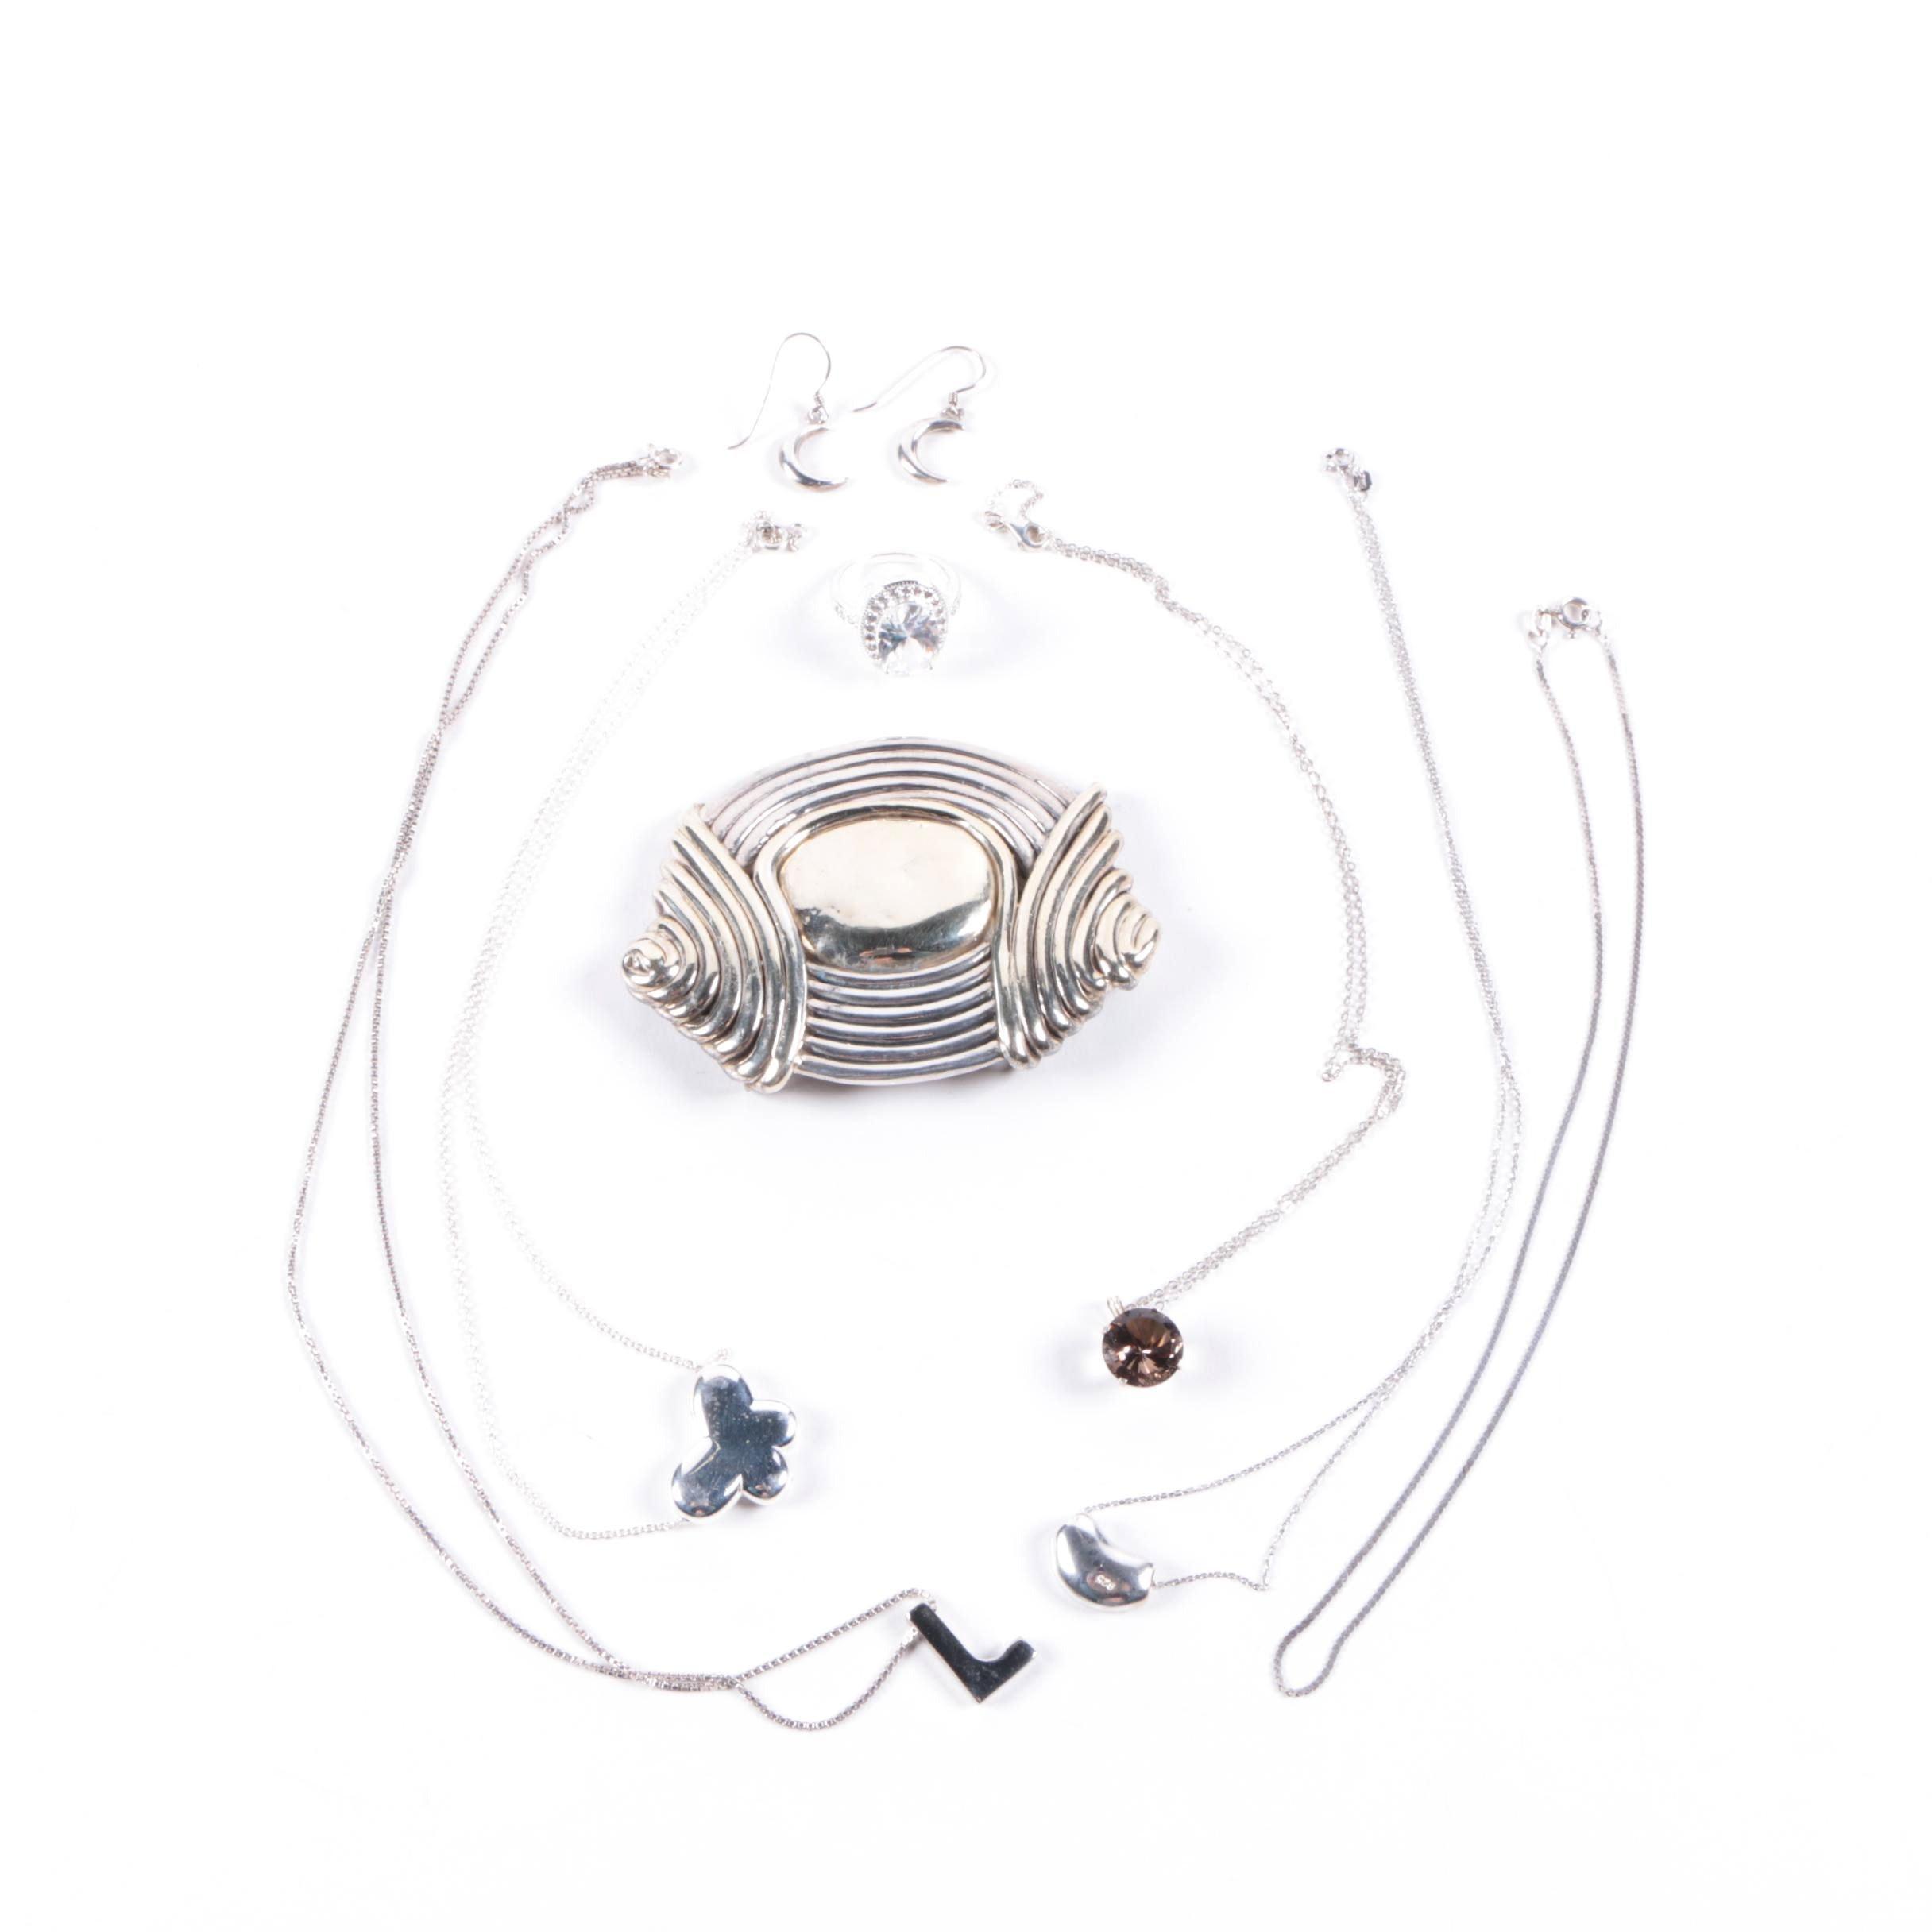 Assorted Sterling Silver Jewelry Including Smoky Quartz